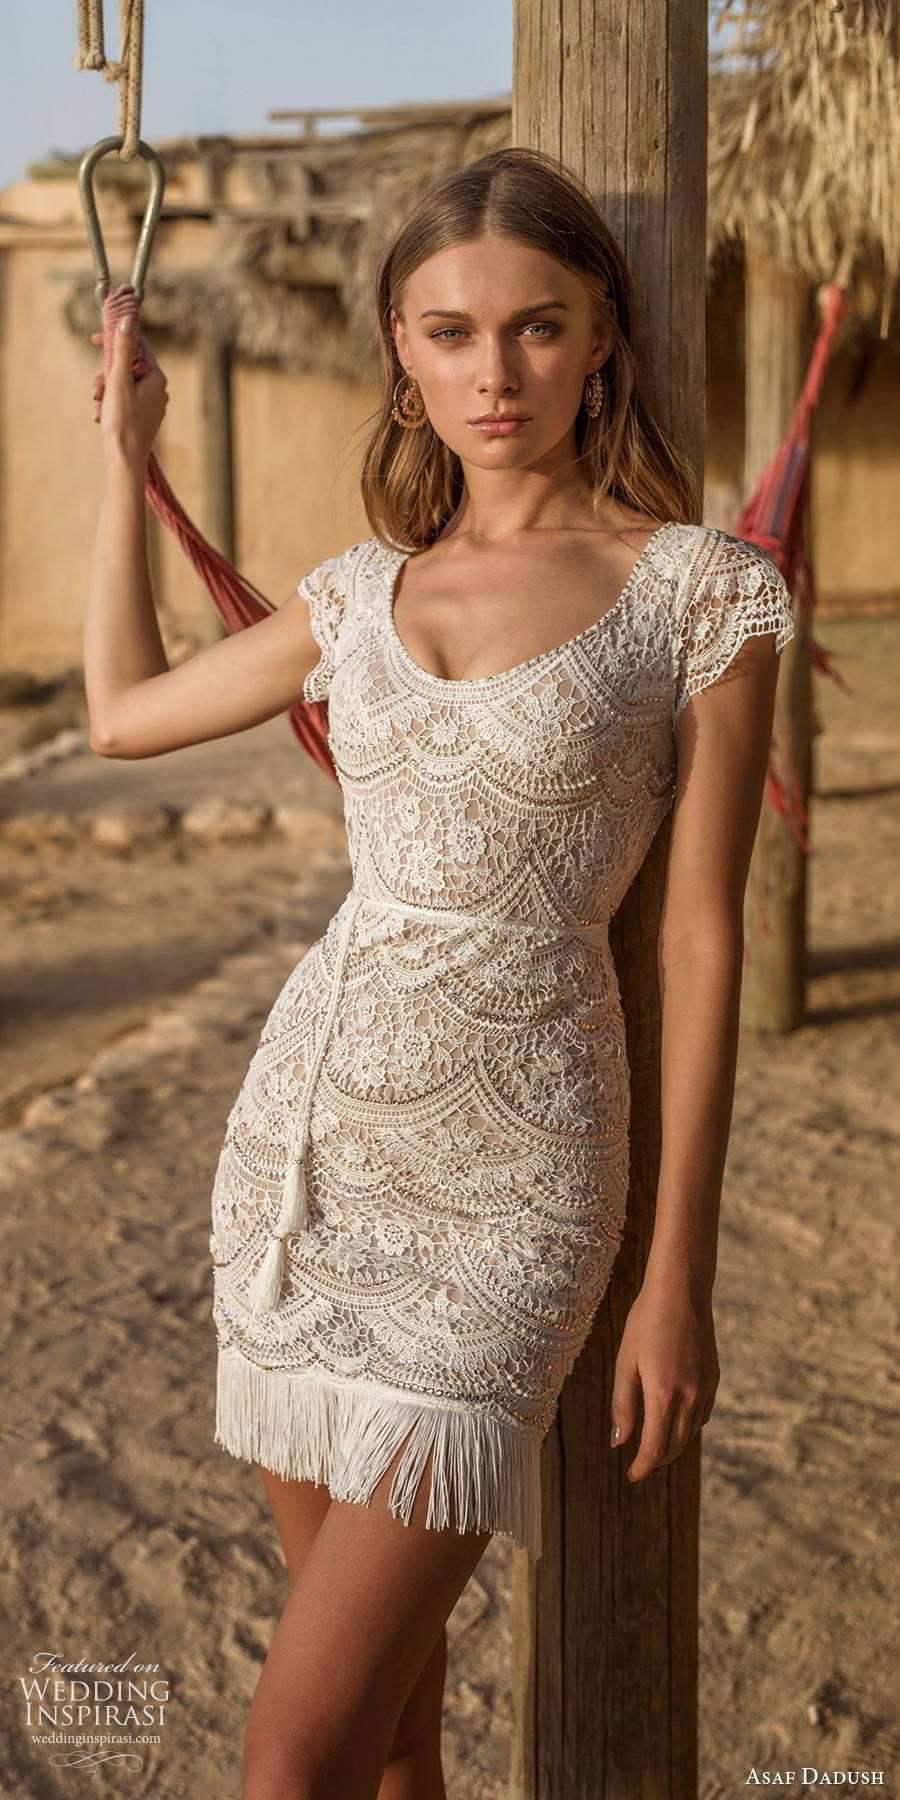 asaf dadush 2019 bridal cap sleeves scoop neckline fully embellished lace romantic boho short wedding dress (12) mv